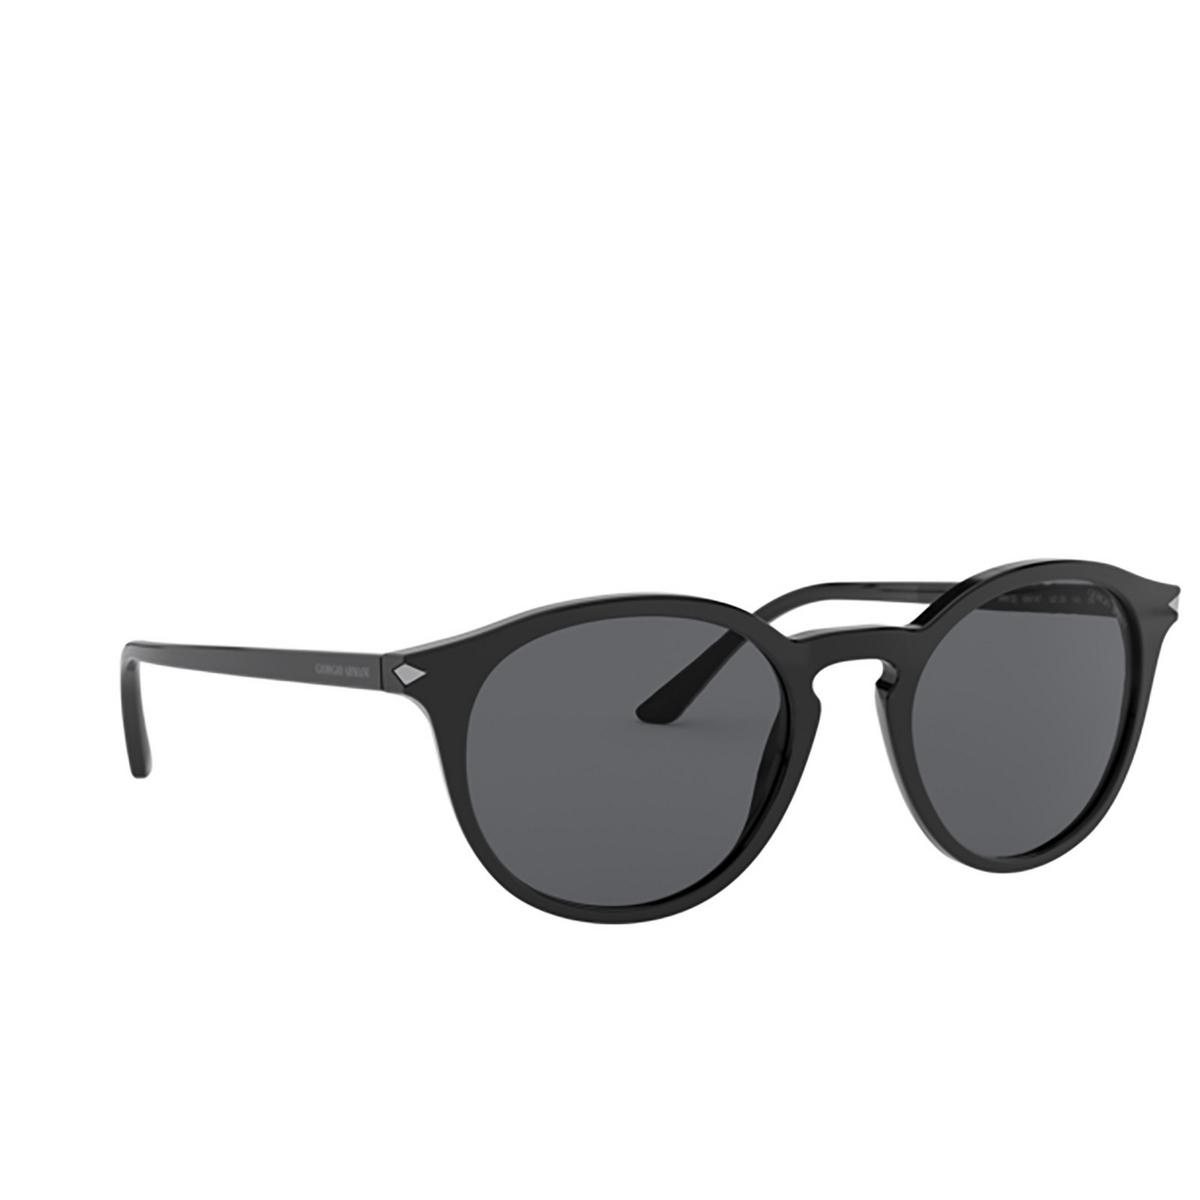 Giorgio Armani® Round Sunglasses: AR8122 color Black 500187 - three-quarters view.